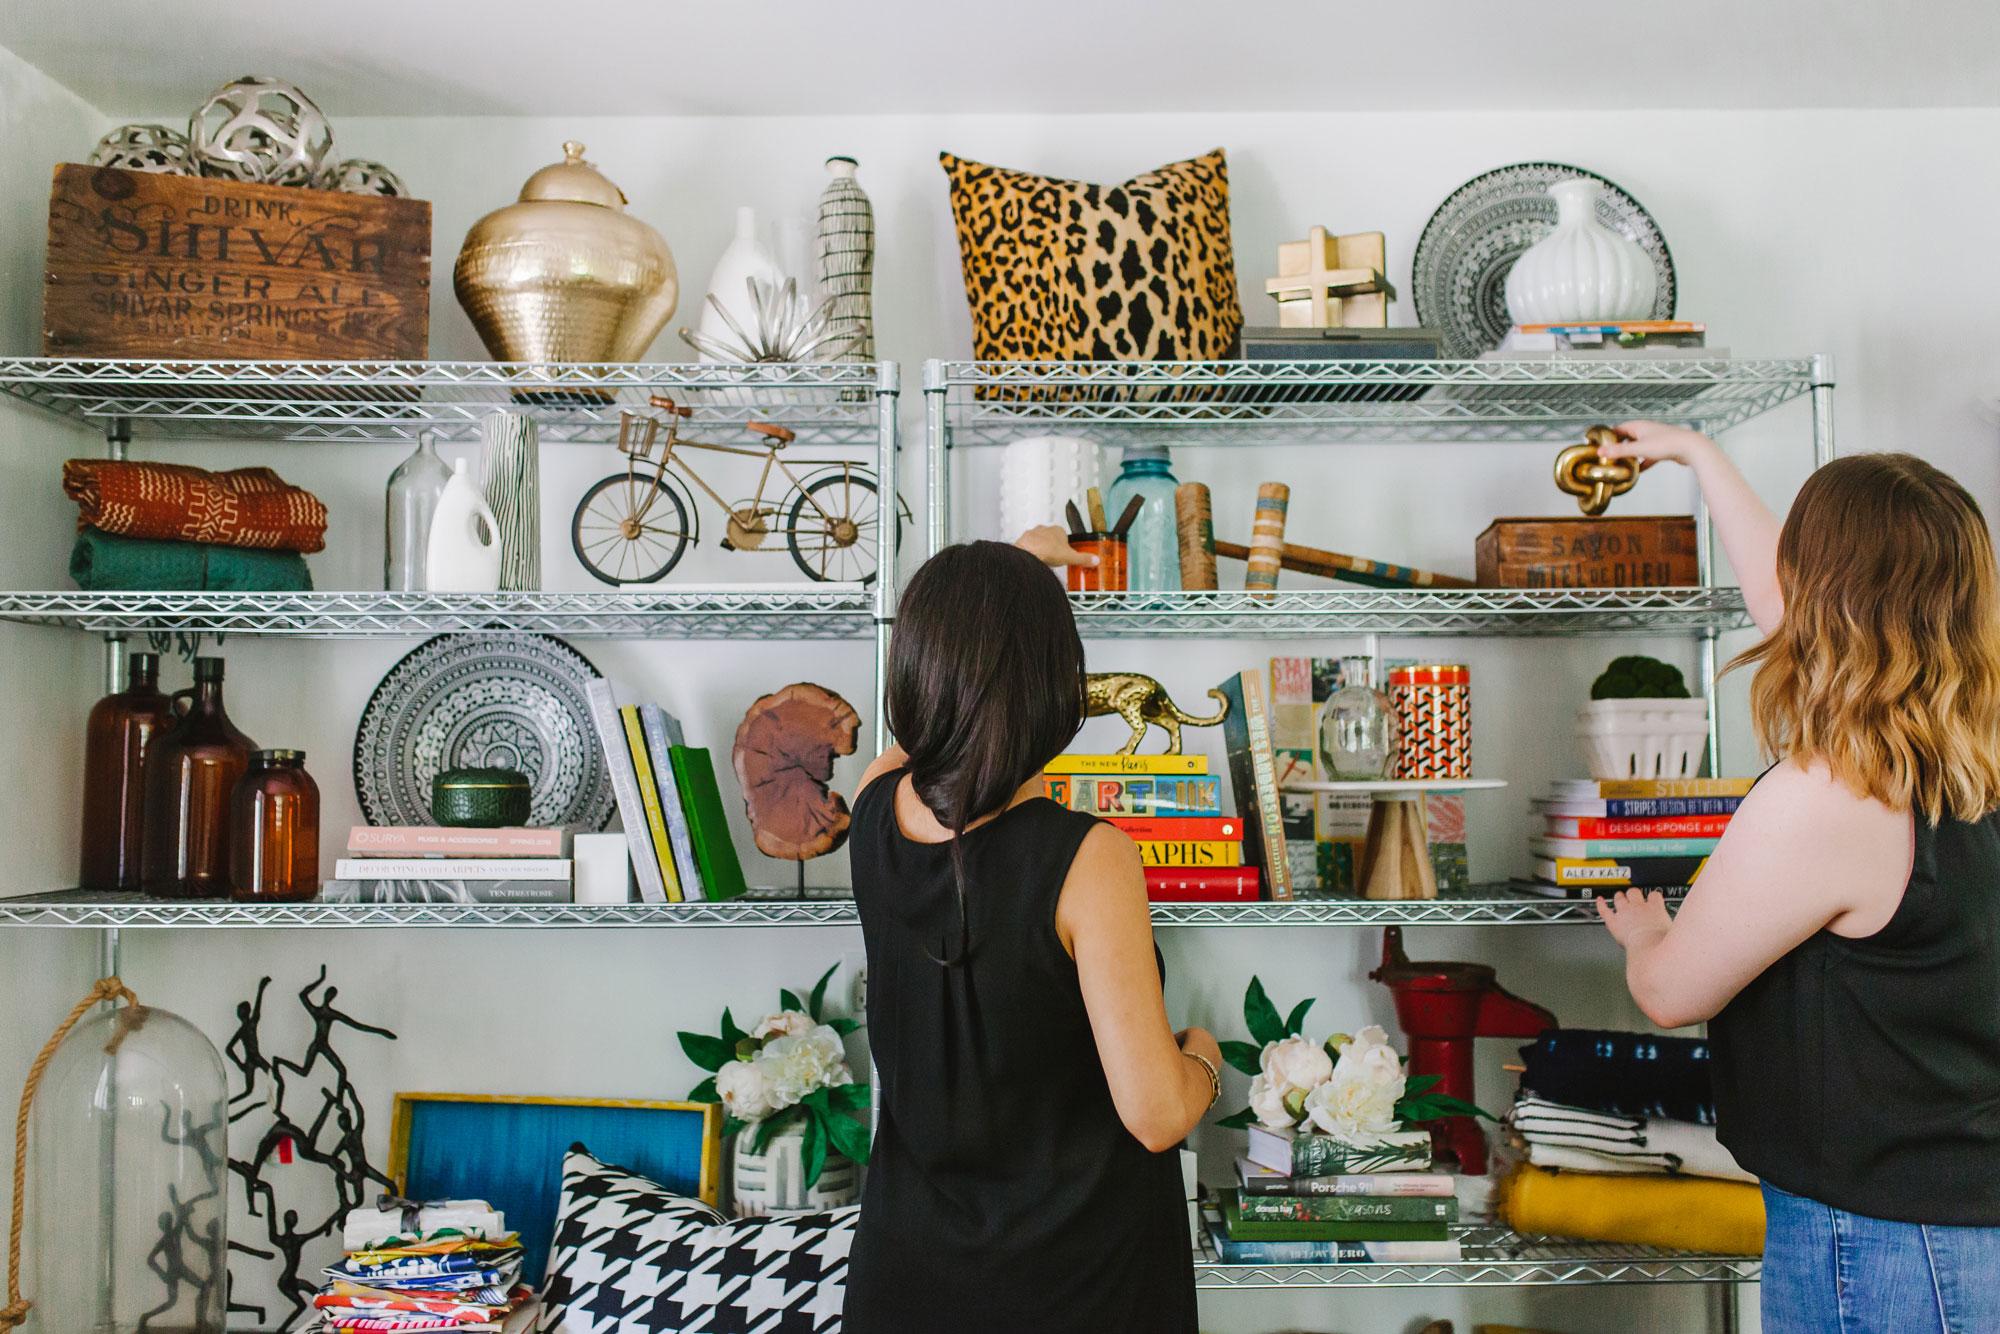 Verena Dalati Salmé and Victoria Lindbergh in Yellow Bungalow Studio's Inventory Room